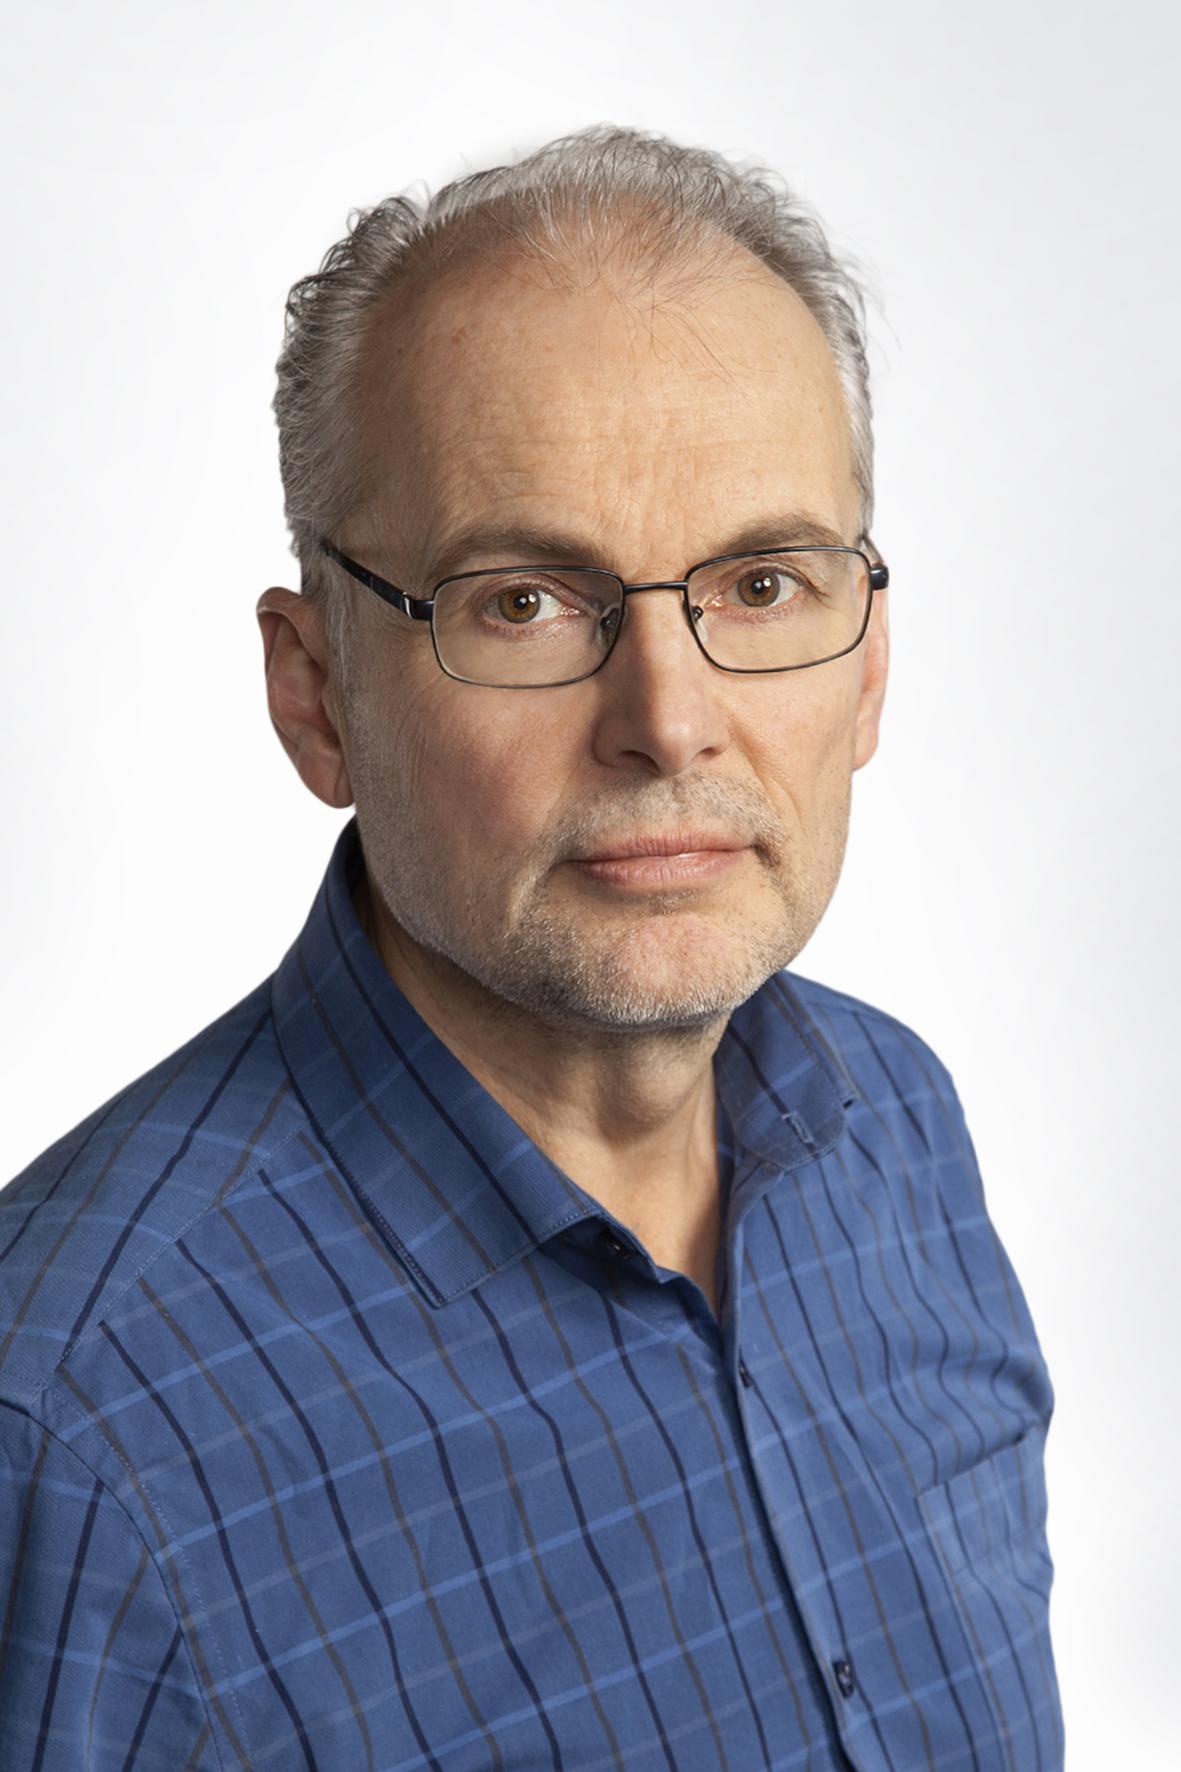 Risto Salovaara : isännöitsijä, ITS, LKV